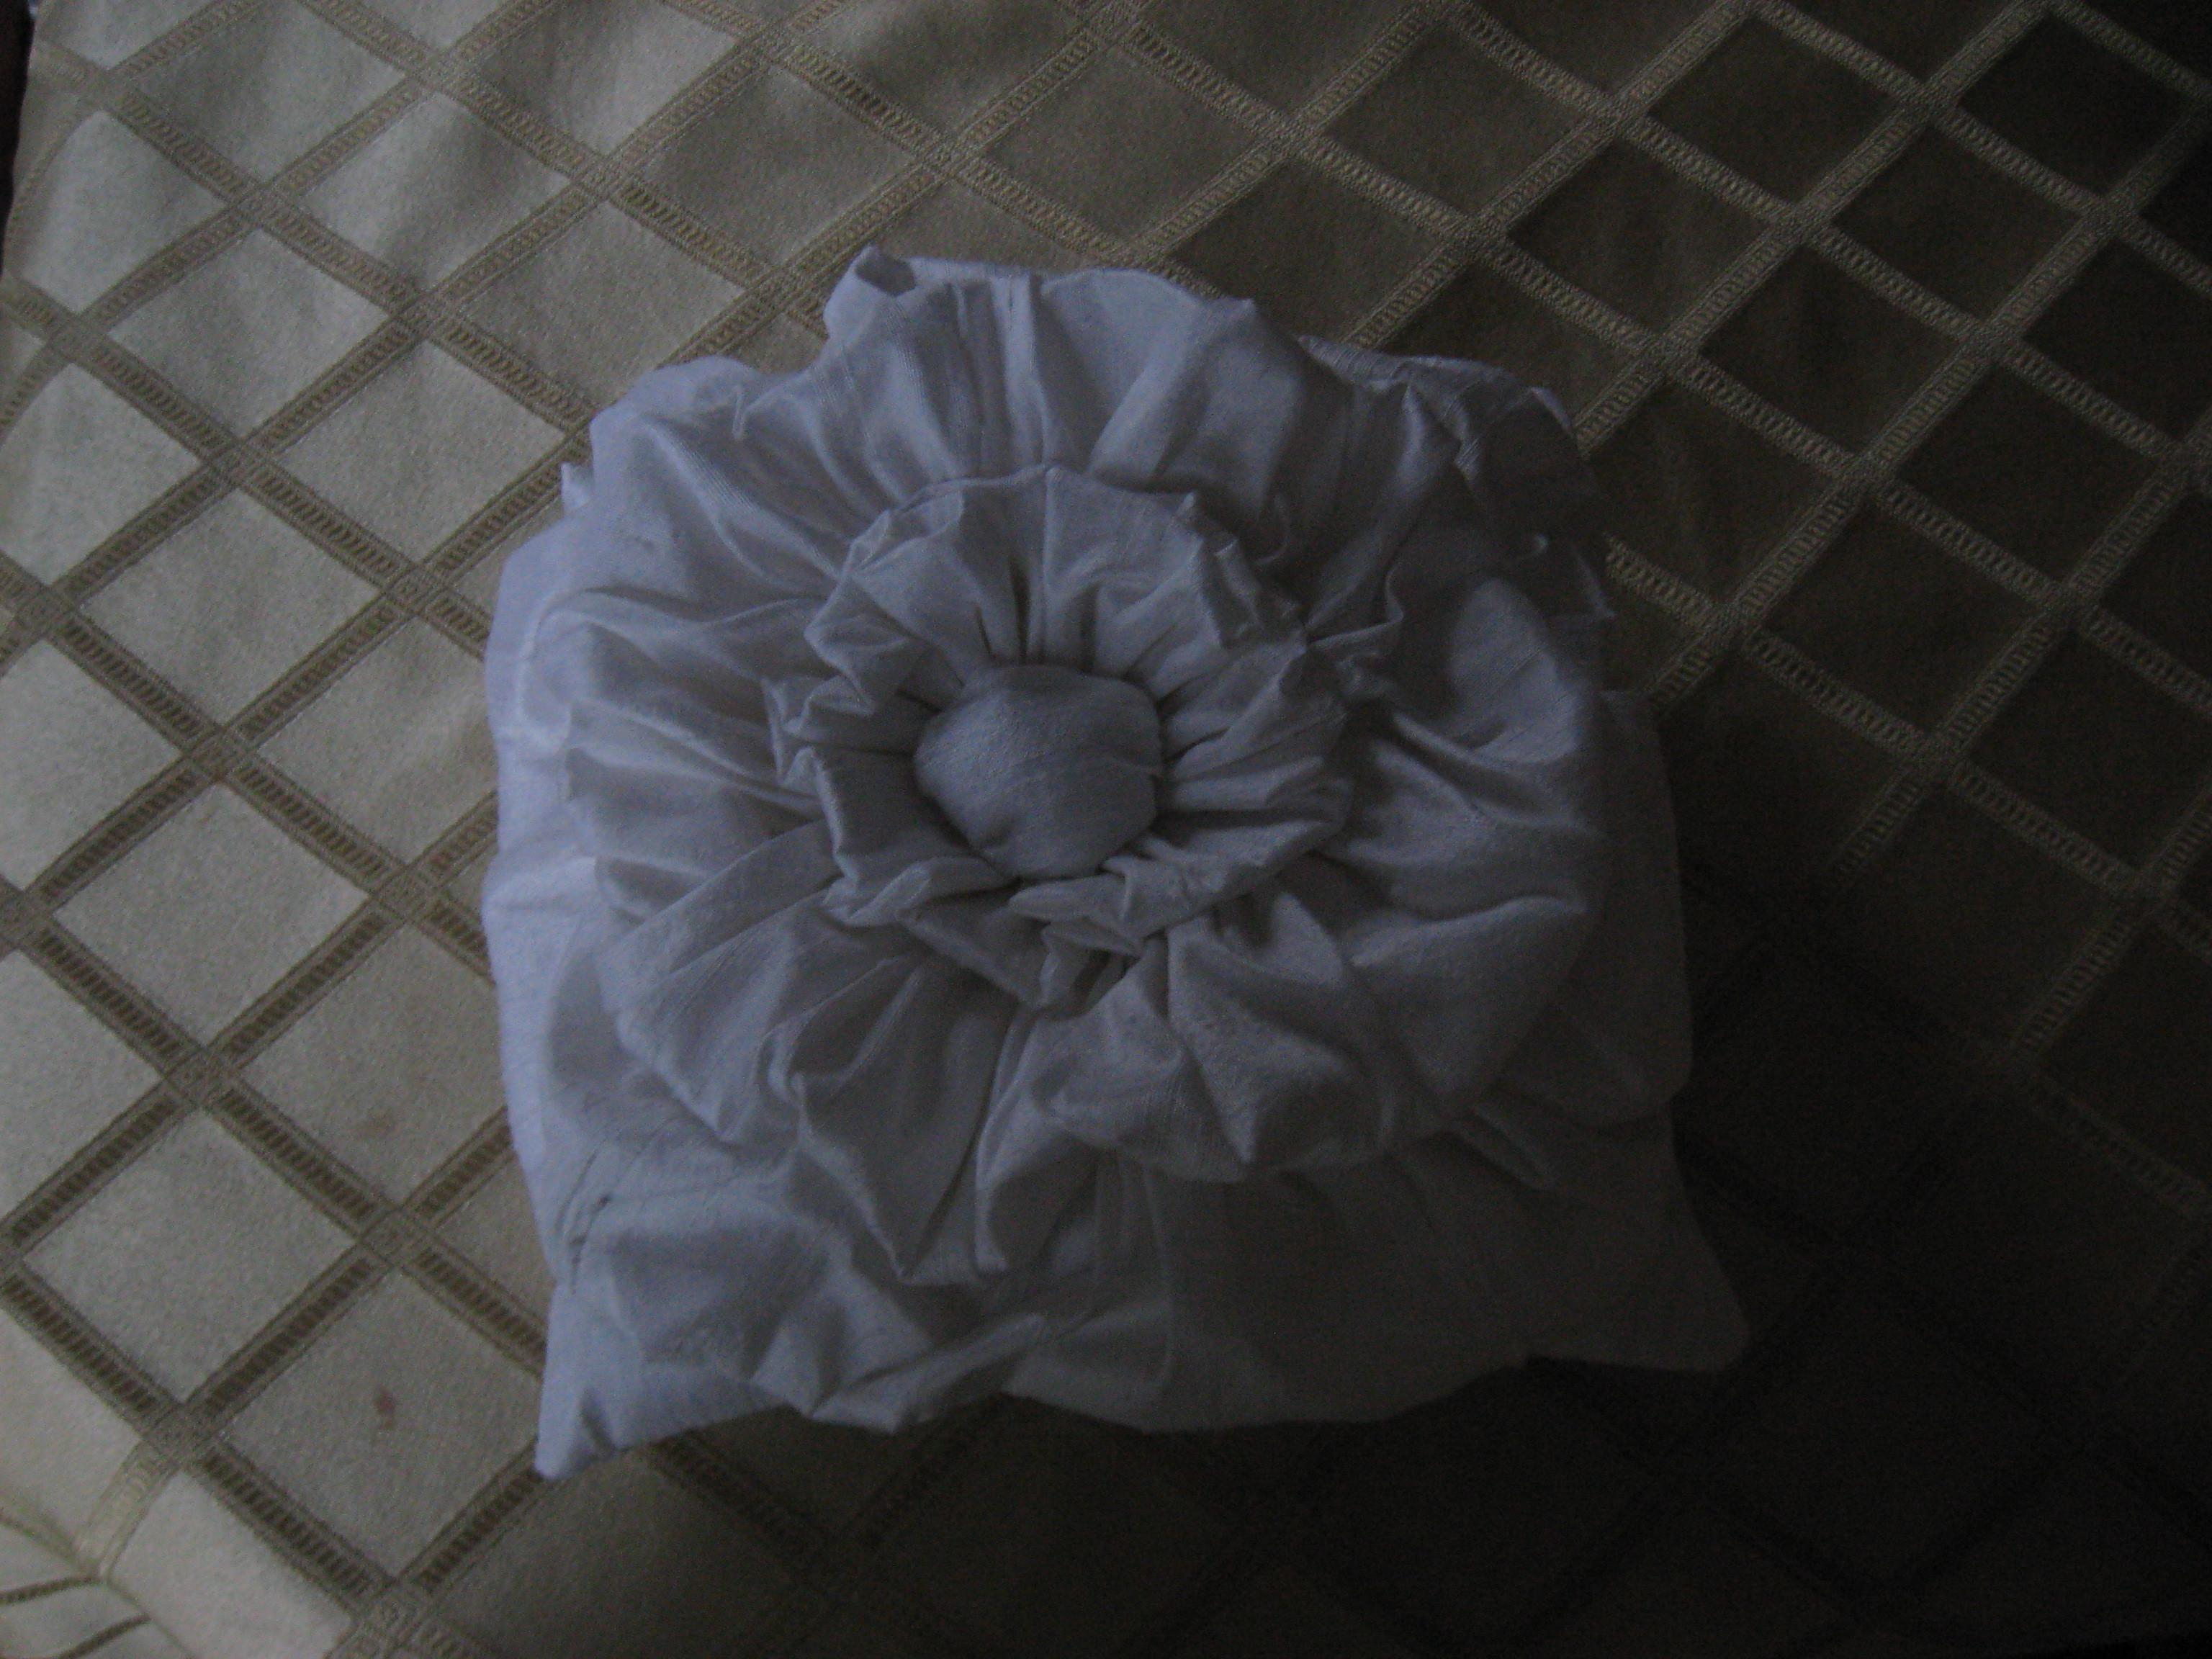 Ceremony, Flowers & Decor, white, Ring, Pillow